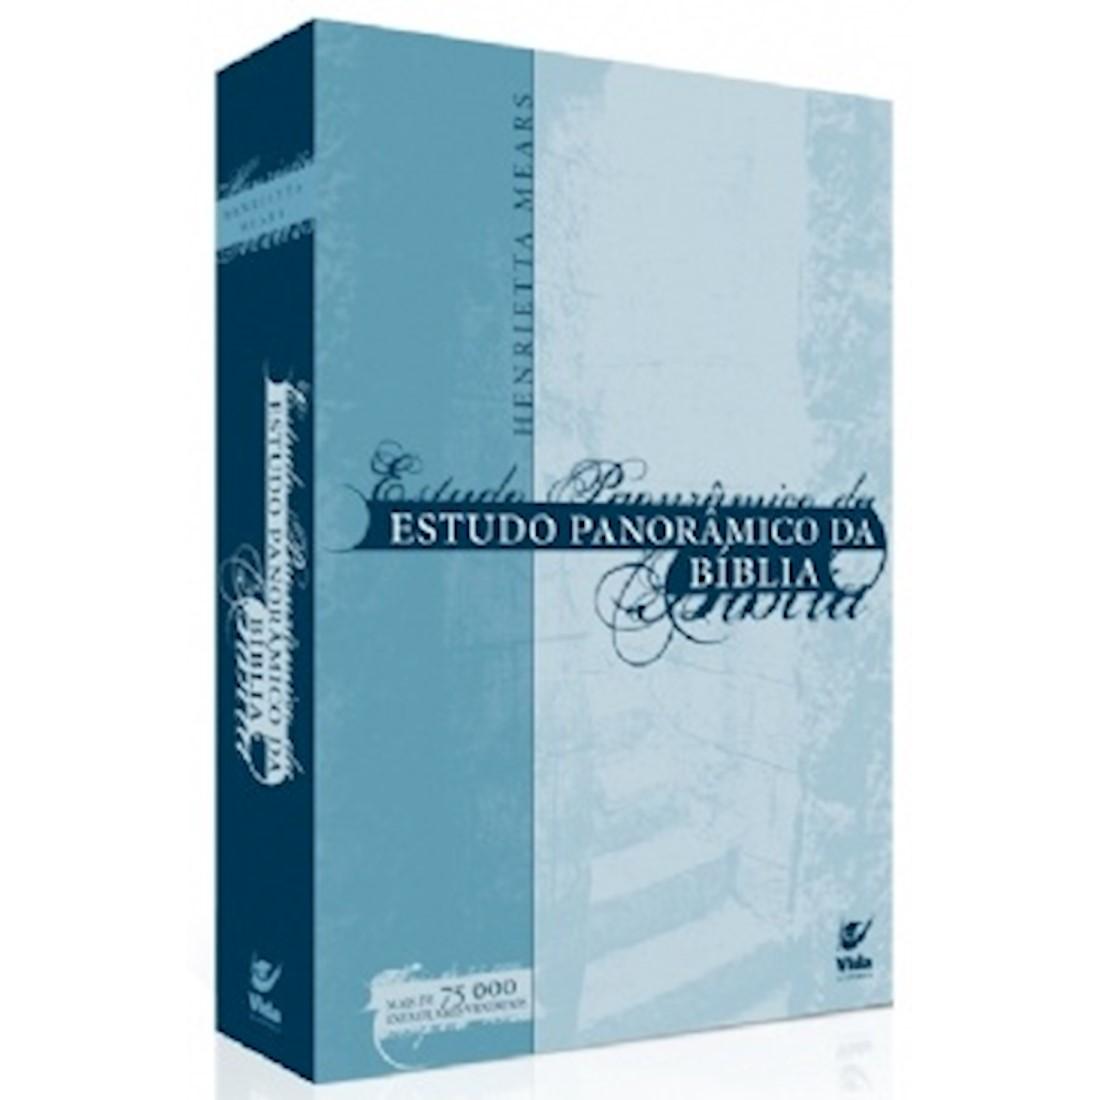 Livro Estudo Panorâmico da Bíblia